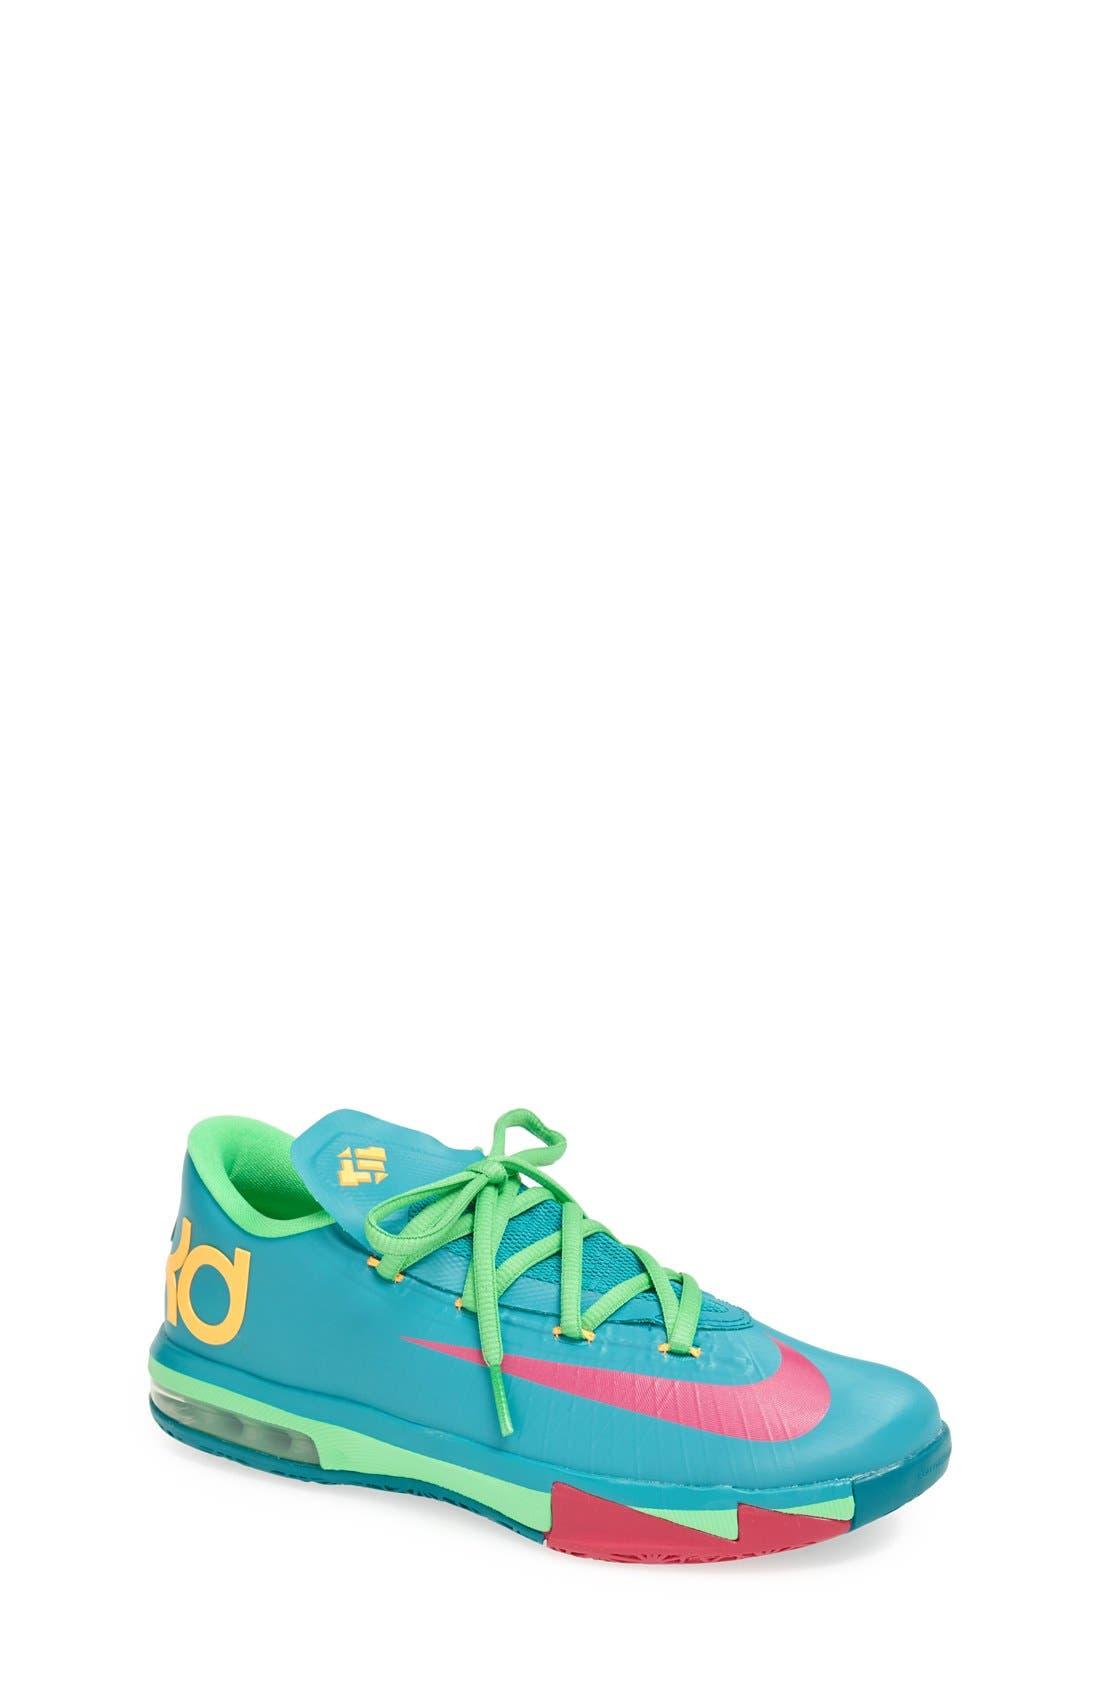 Alternate Image 1 Selected - Nike 'KD VI' Basketball Shoe (Big Kid)